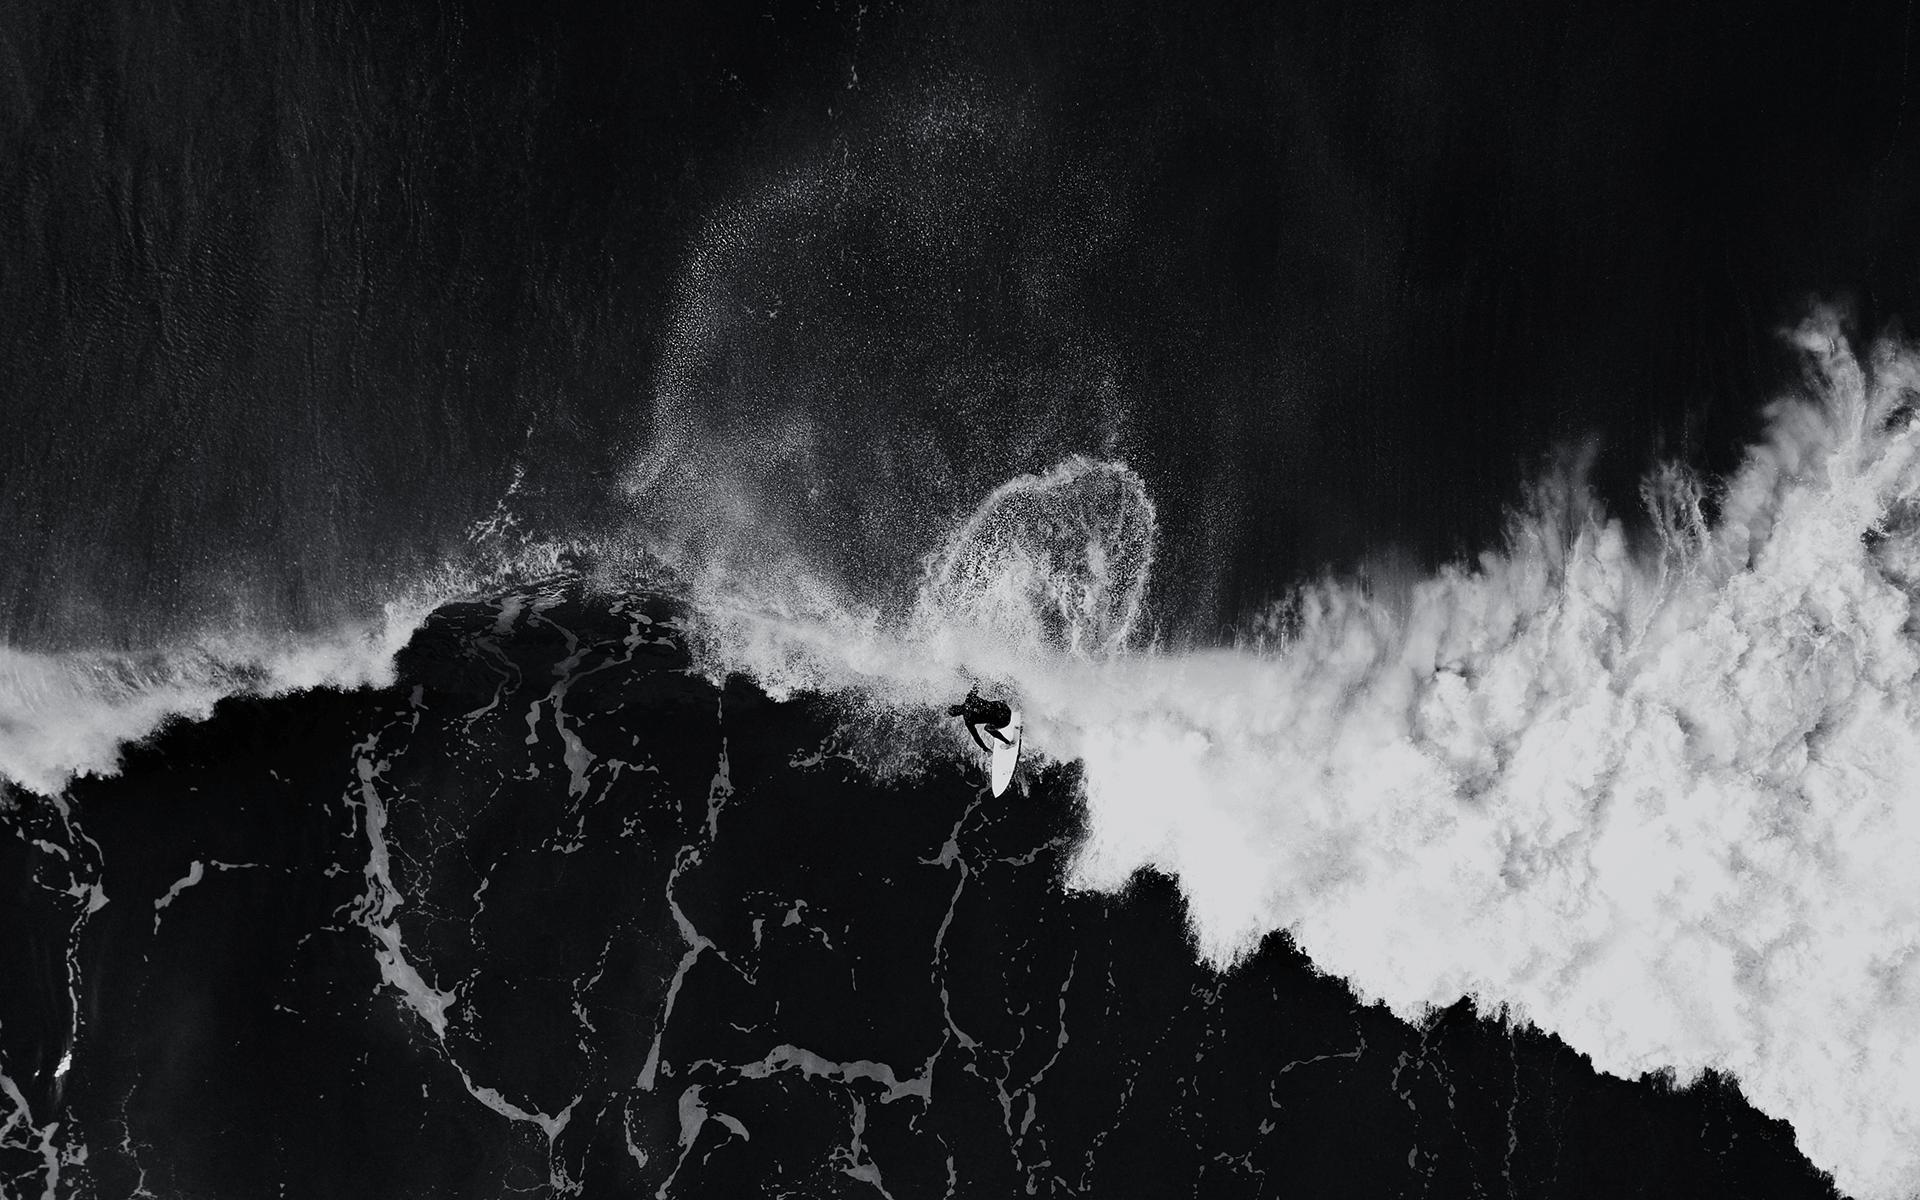 Surfing - Kensuke Saito Surf Photography, Unsplash web